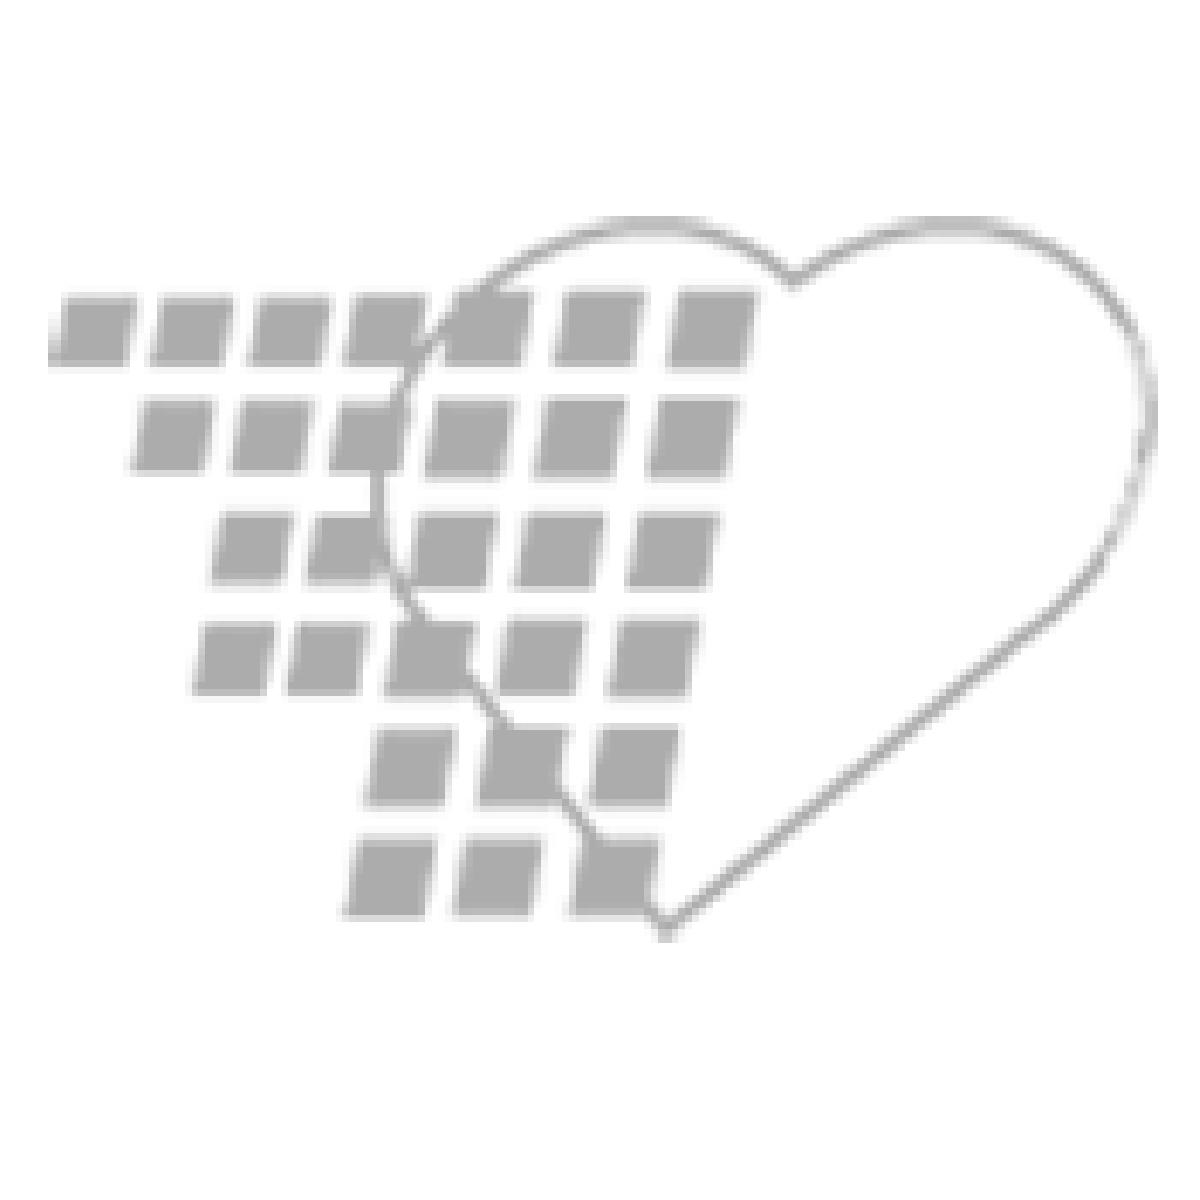 11-81-0105 Laerdal Wound Care Assessment Set